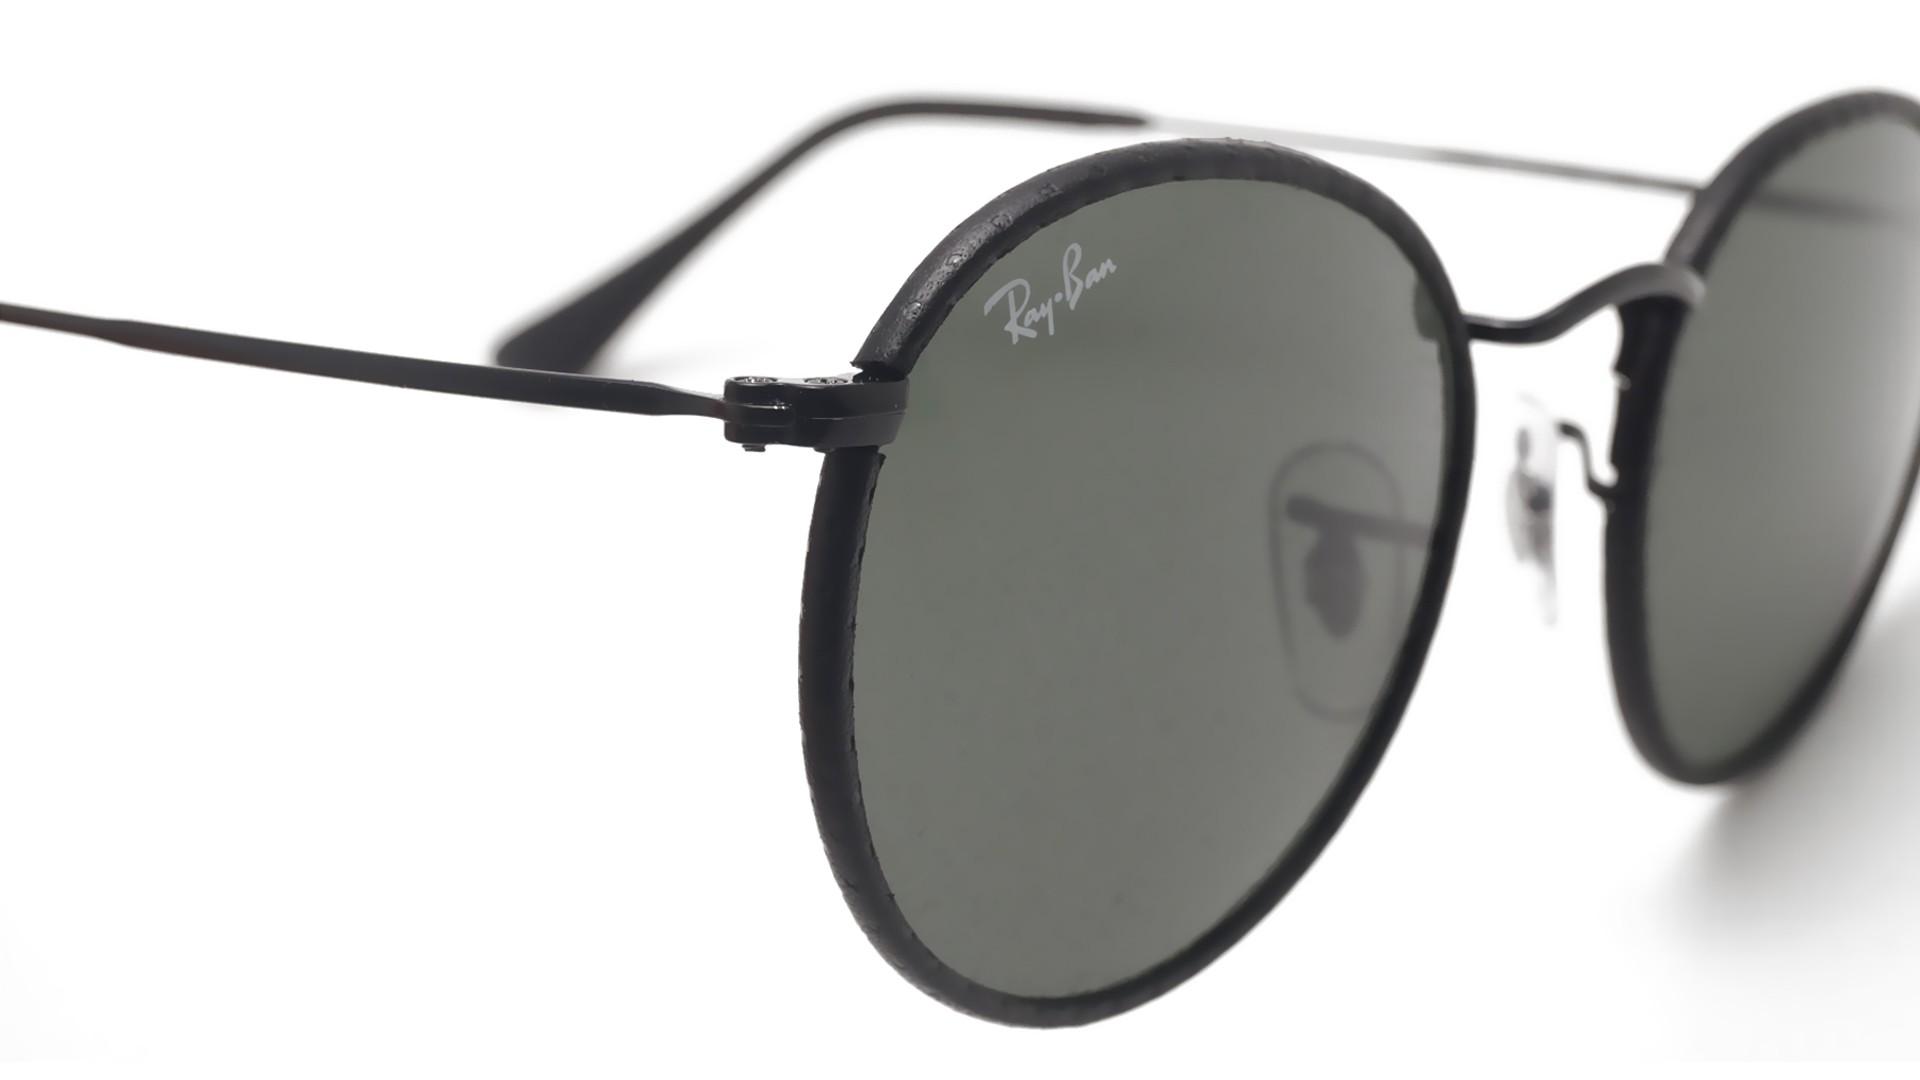 ... shopping sunglasses ray ban round craft black rb3475q 9040 50 21 medium  14d42 b5572 ... 45ad18c57e